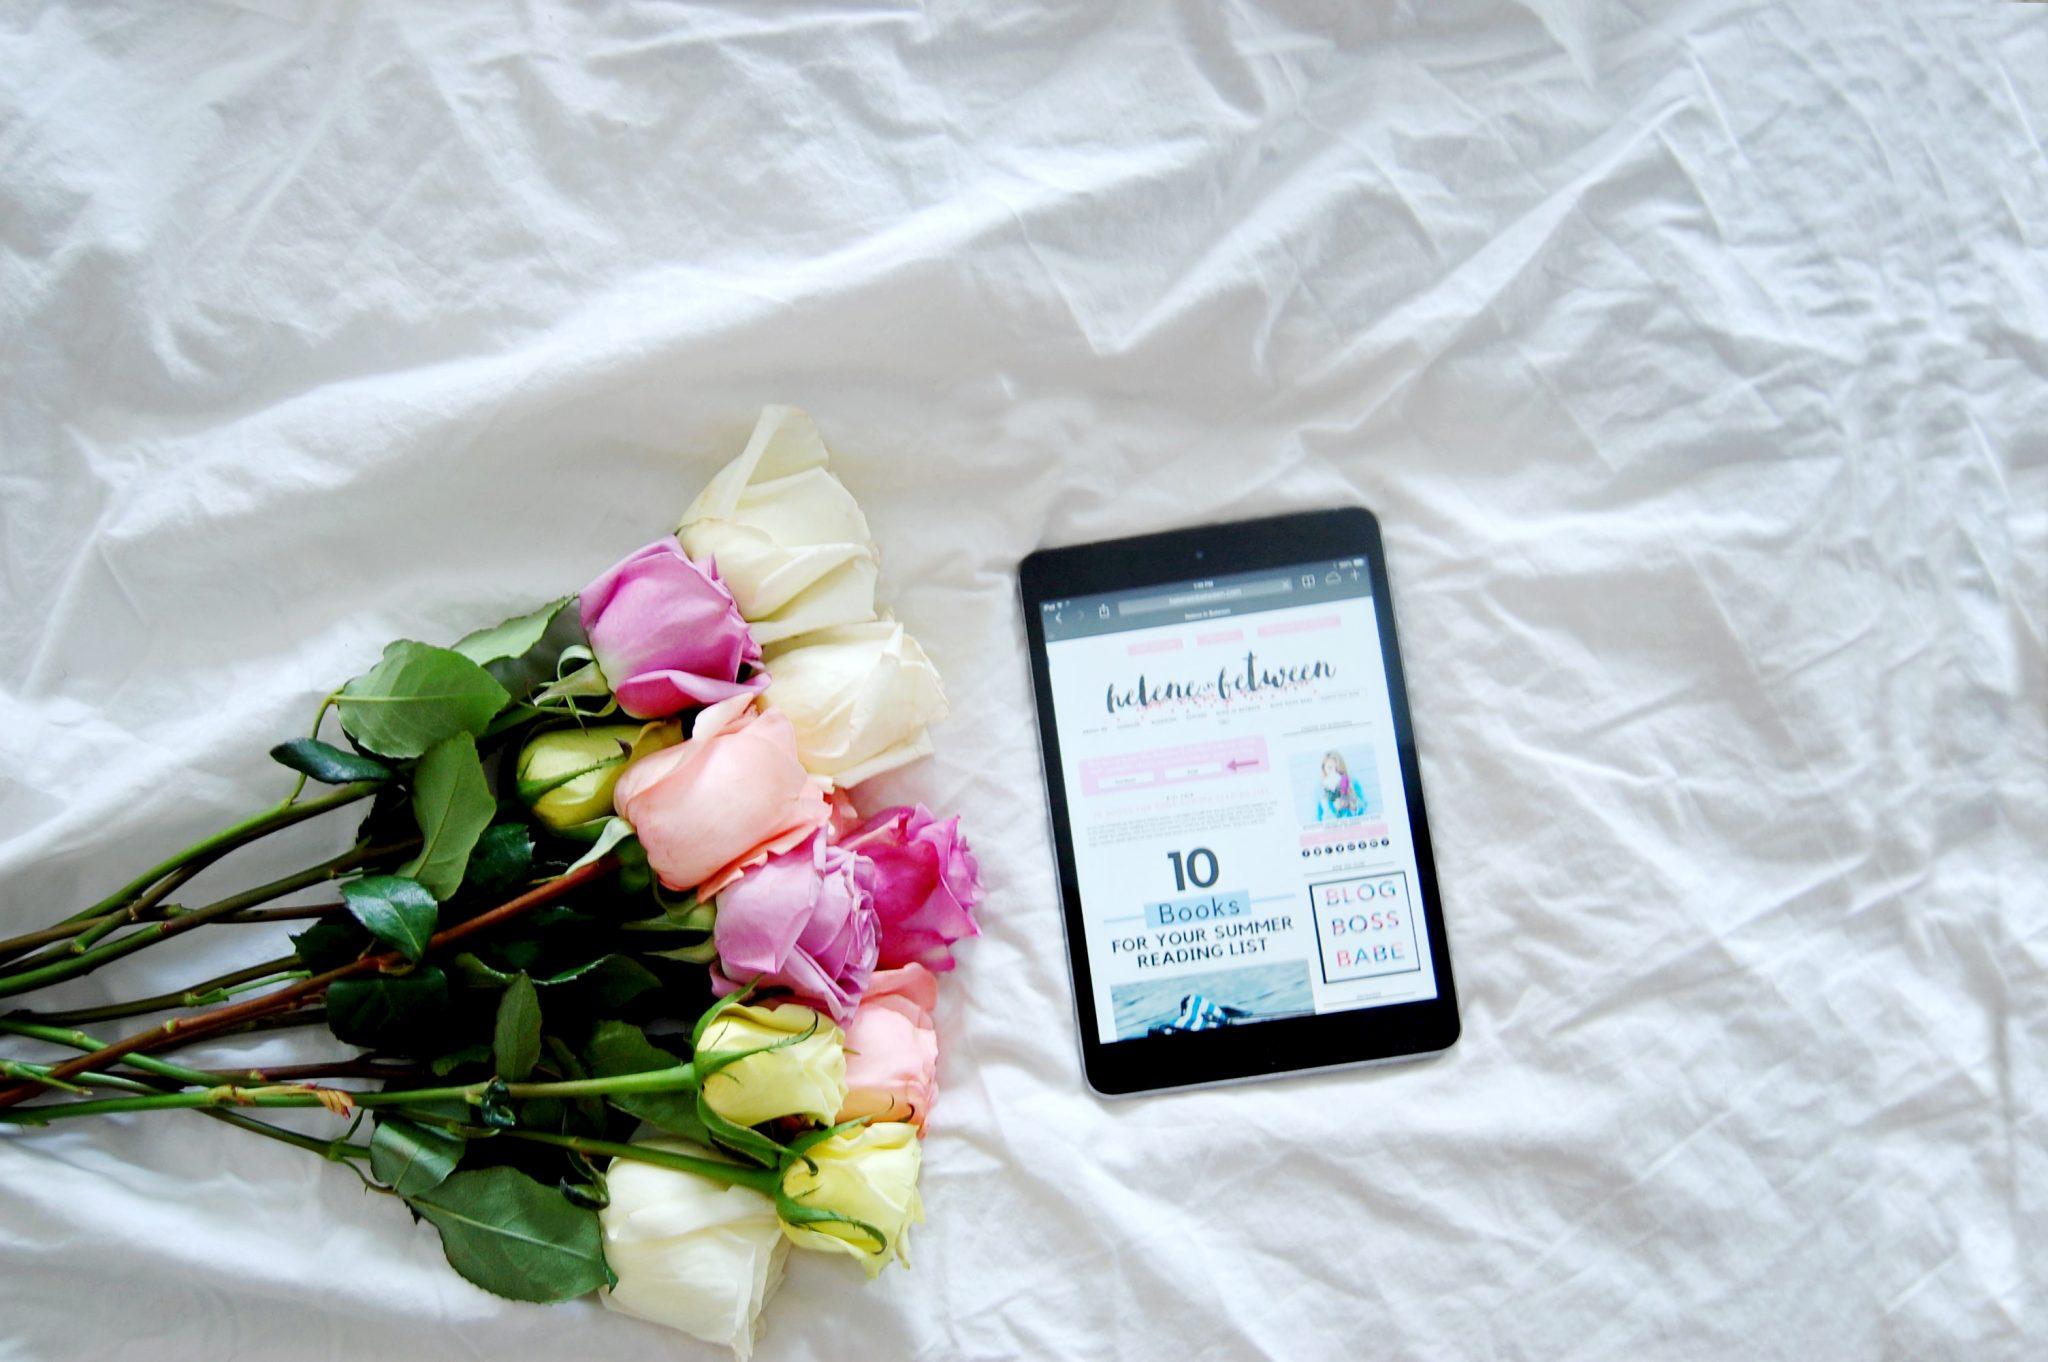 hib_flowers